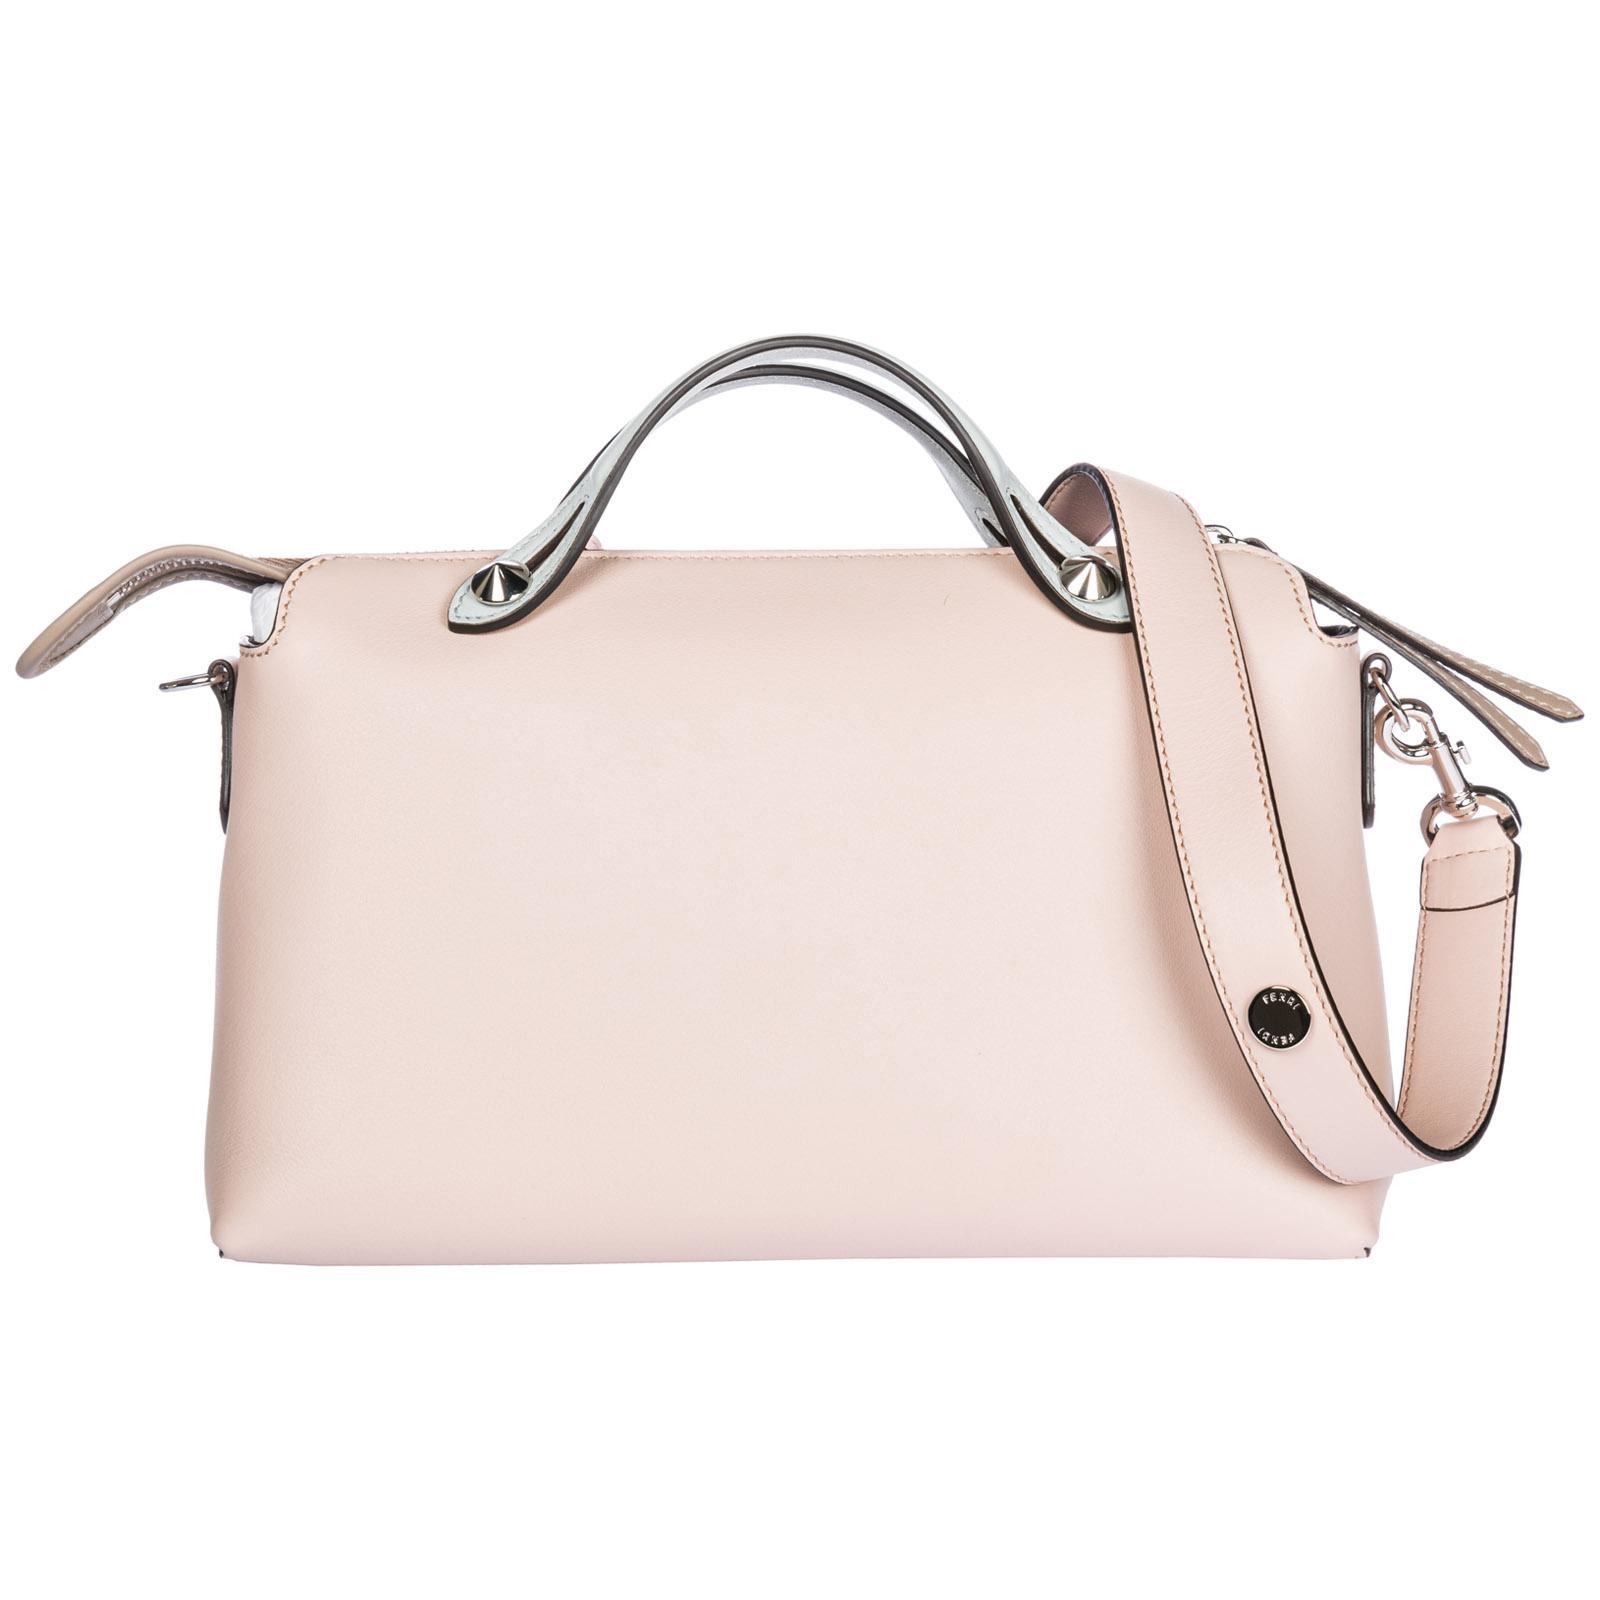 0c4311d3f2f1 Fendi Leather Handbag Barrel Bag Purse By The Way Regular in Pink - Lyst